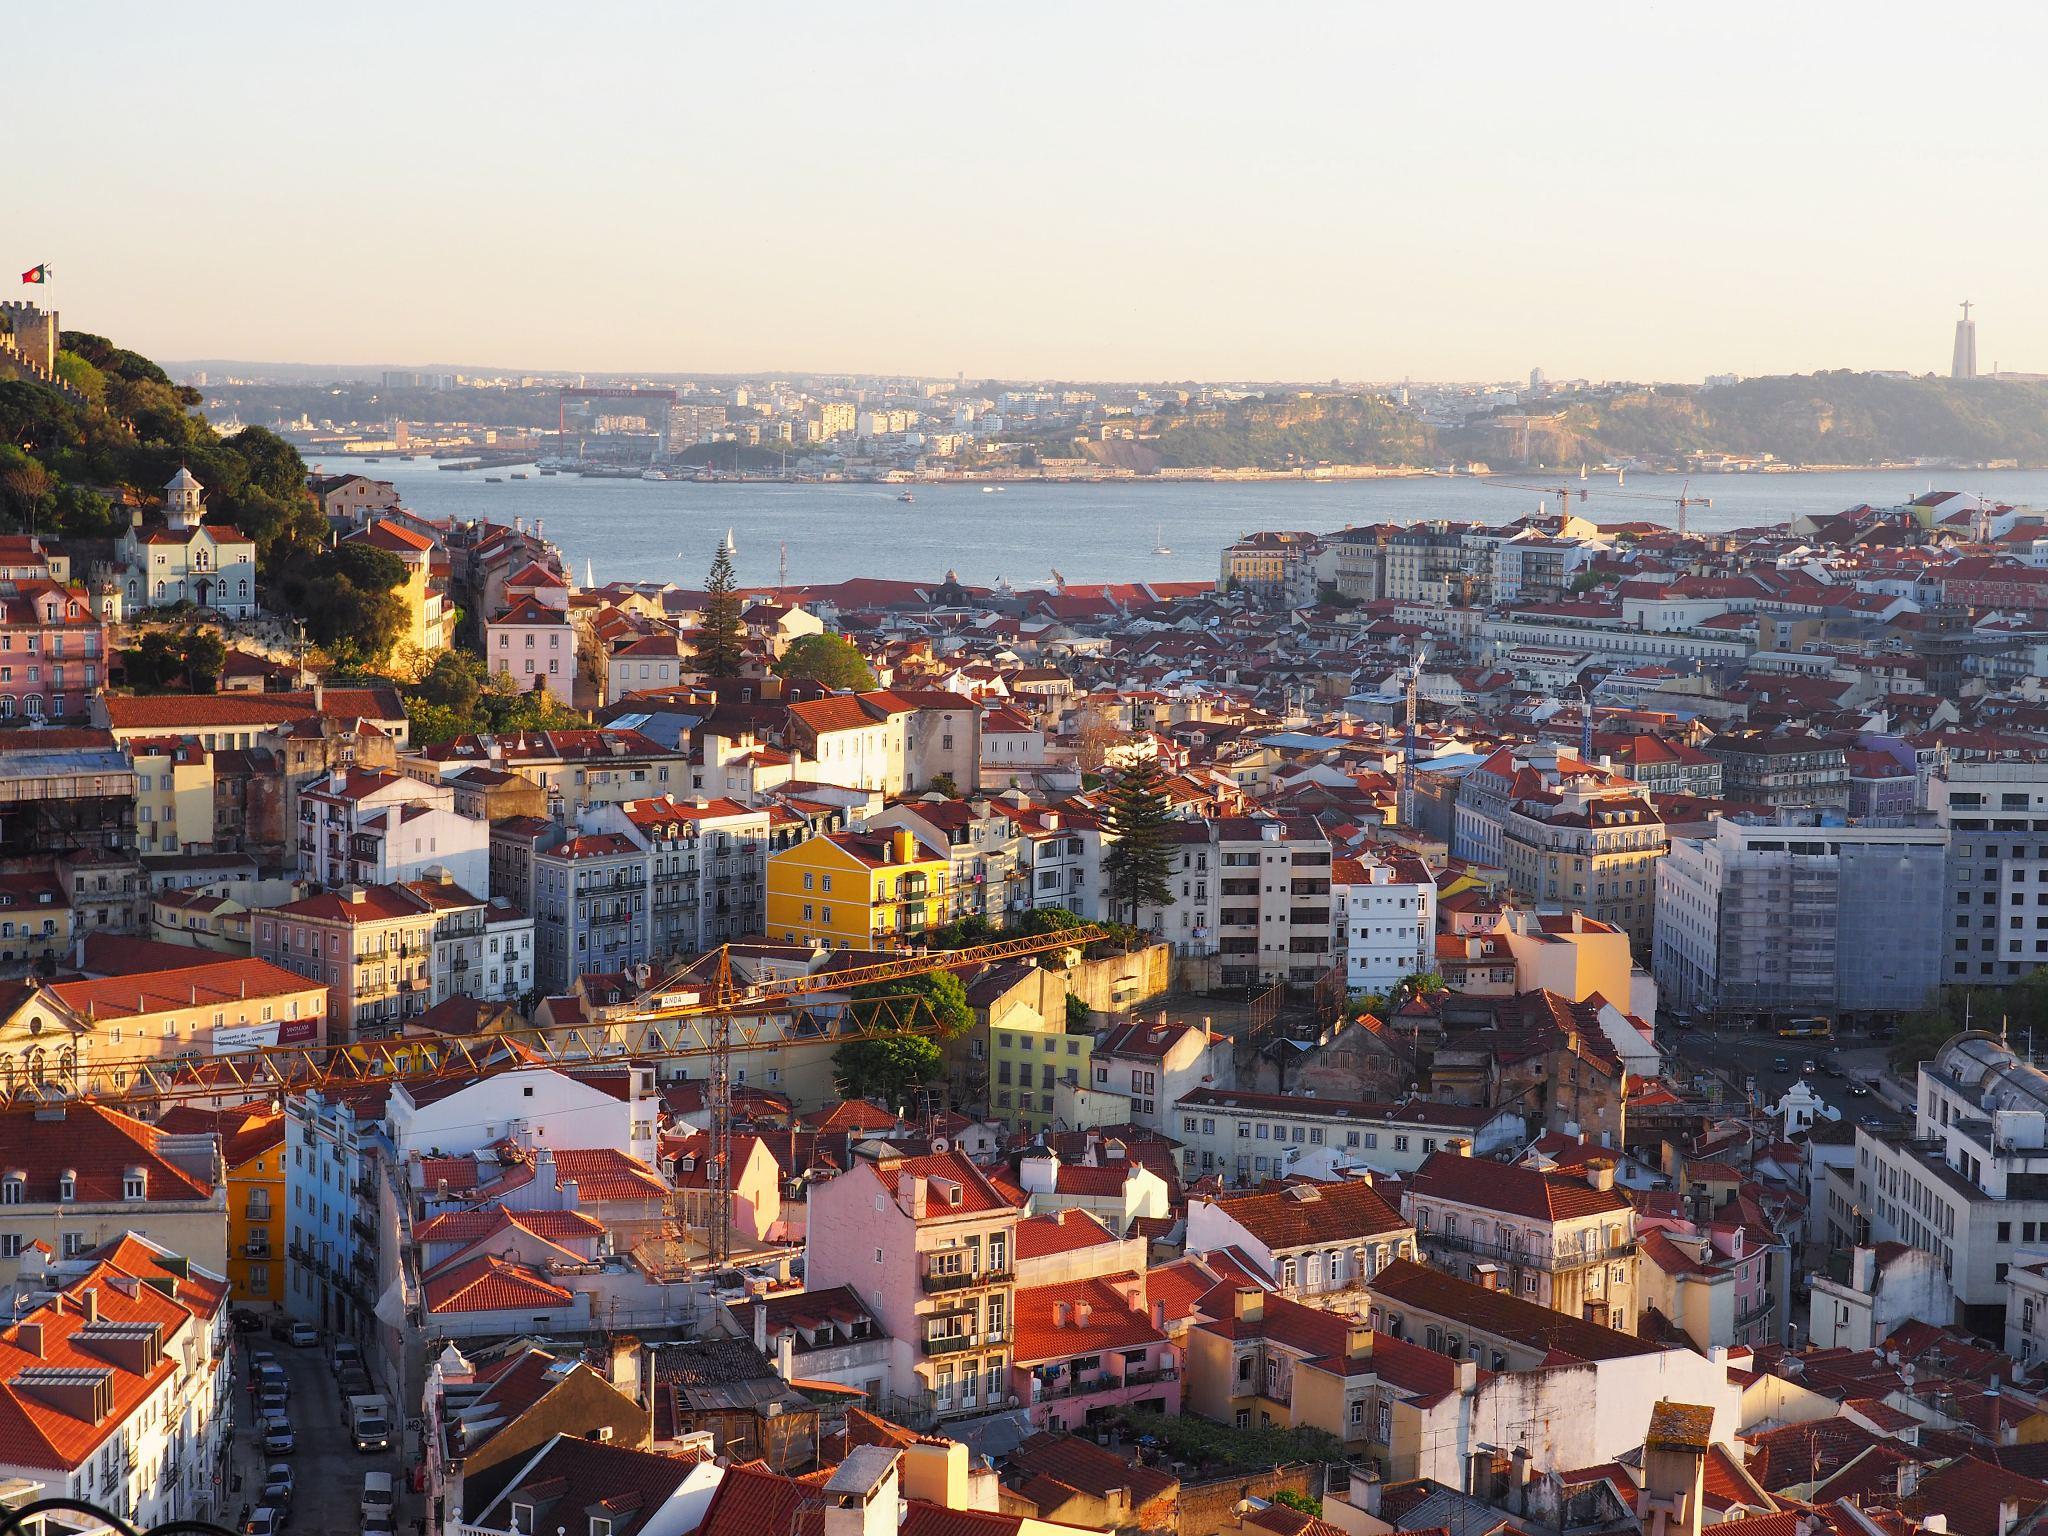 Capital of Portugal, Lisbon